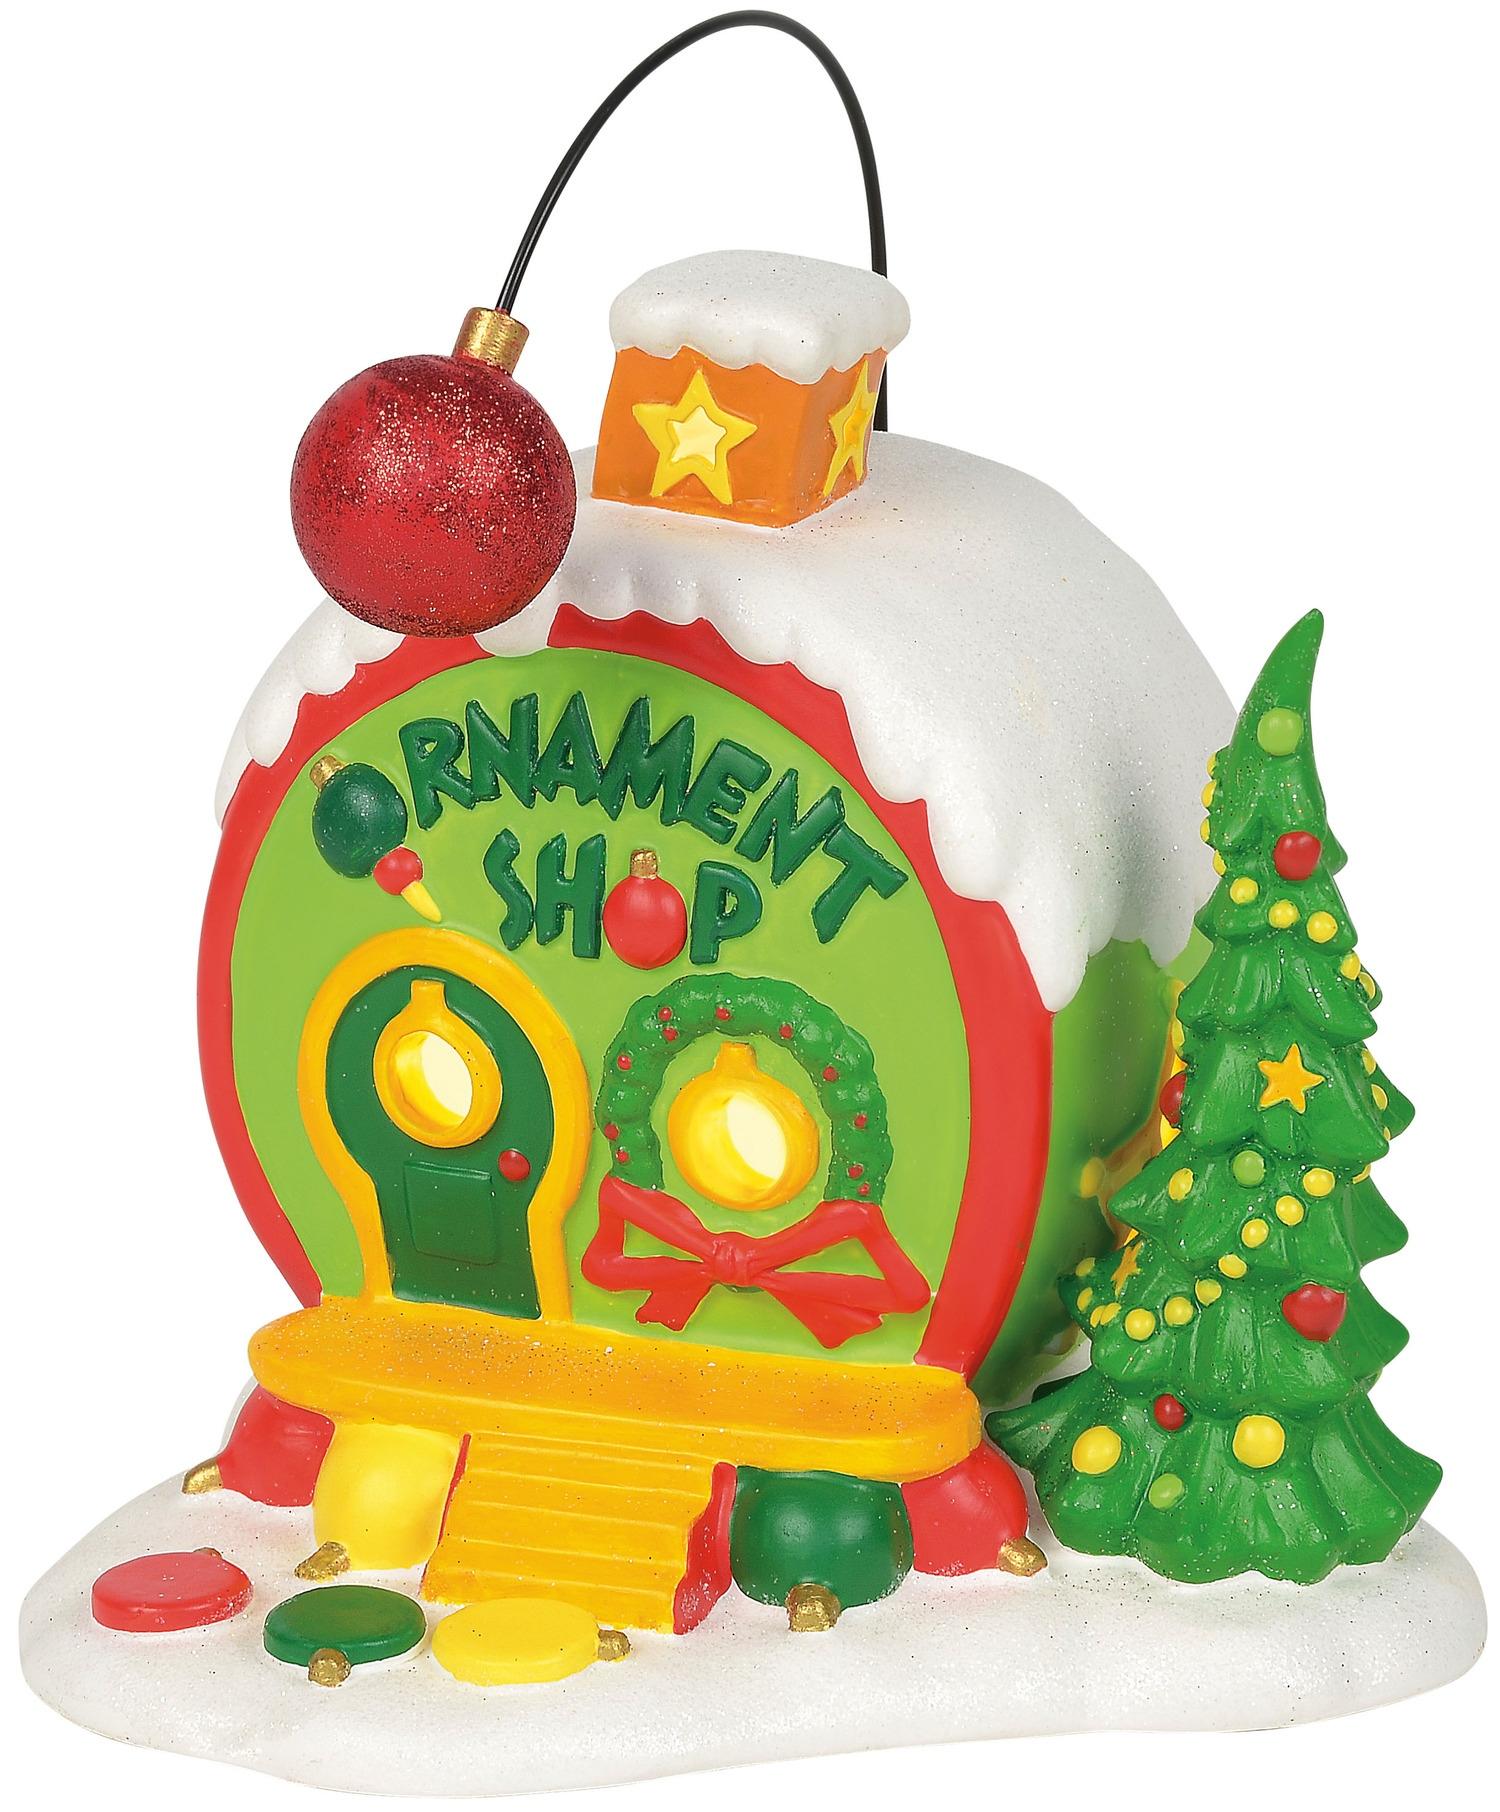 Grinch Villages by Department 56 4059421N Who-Ville Ornament Shop